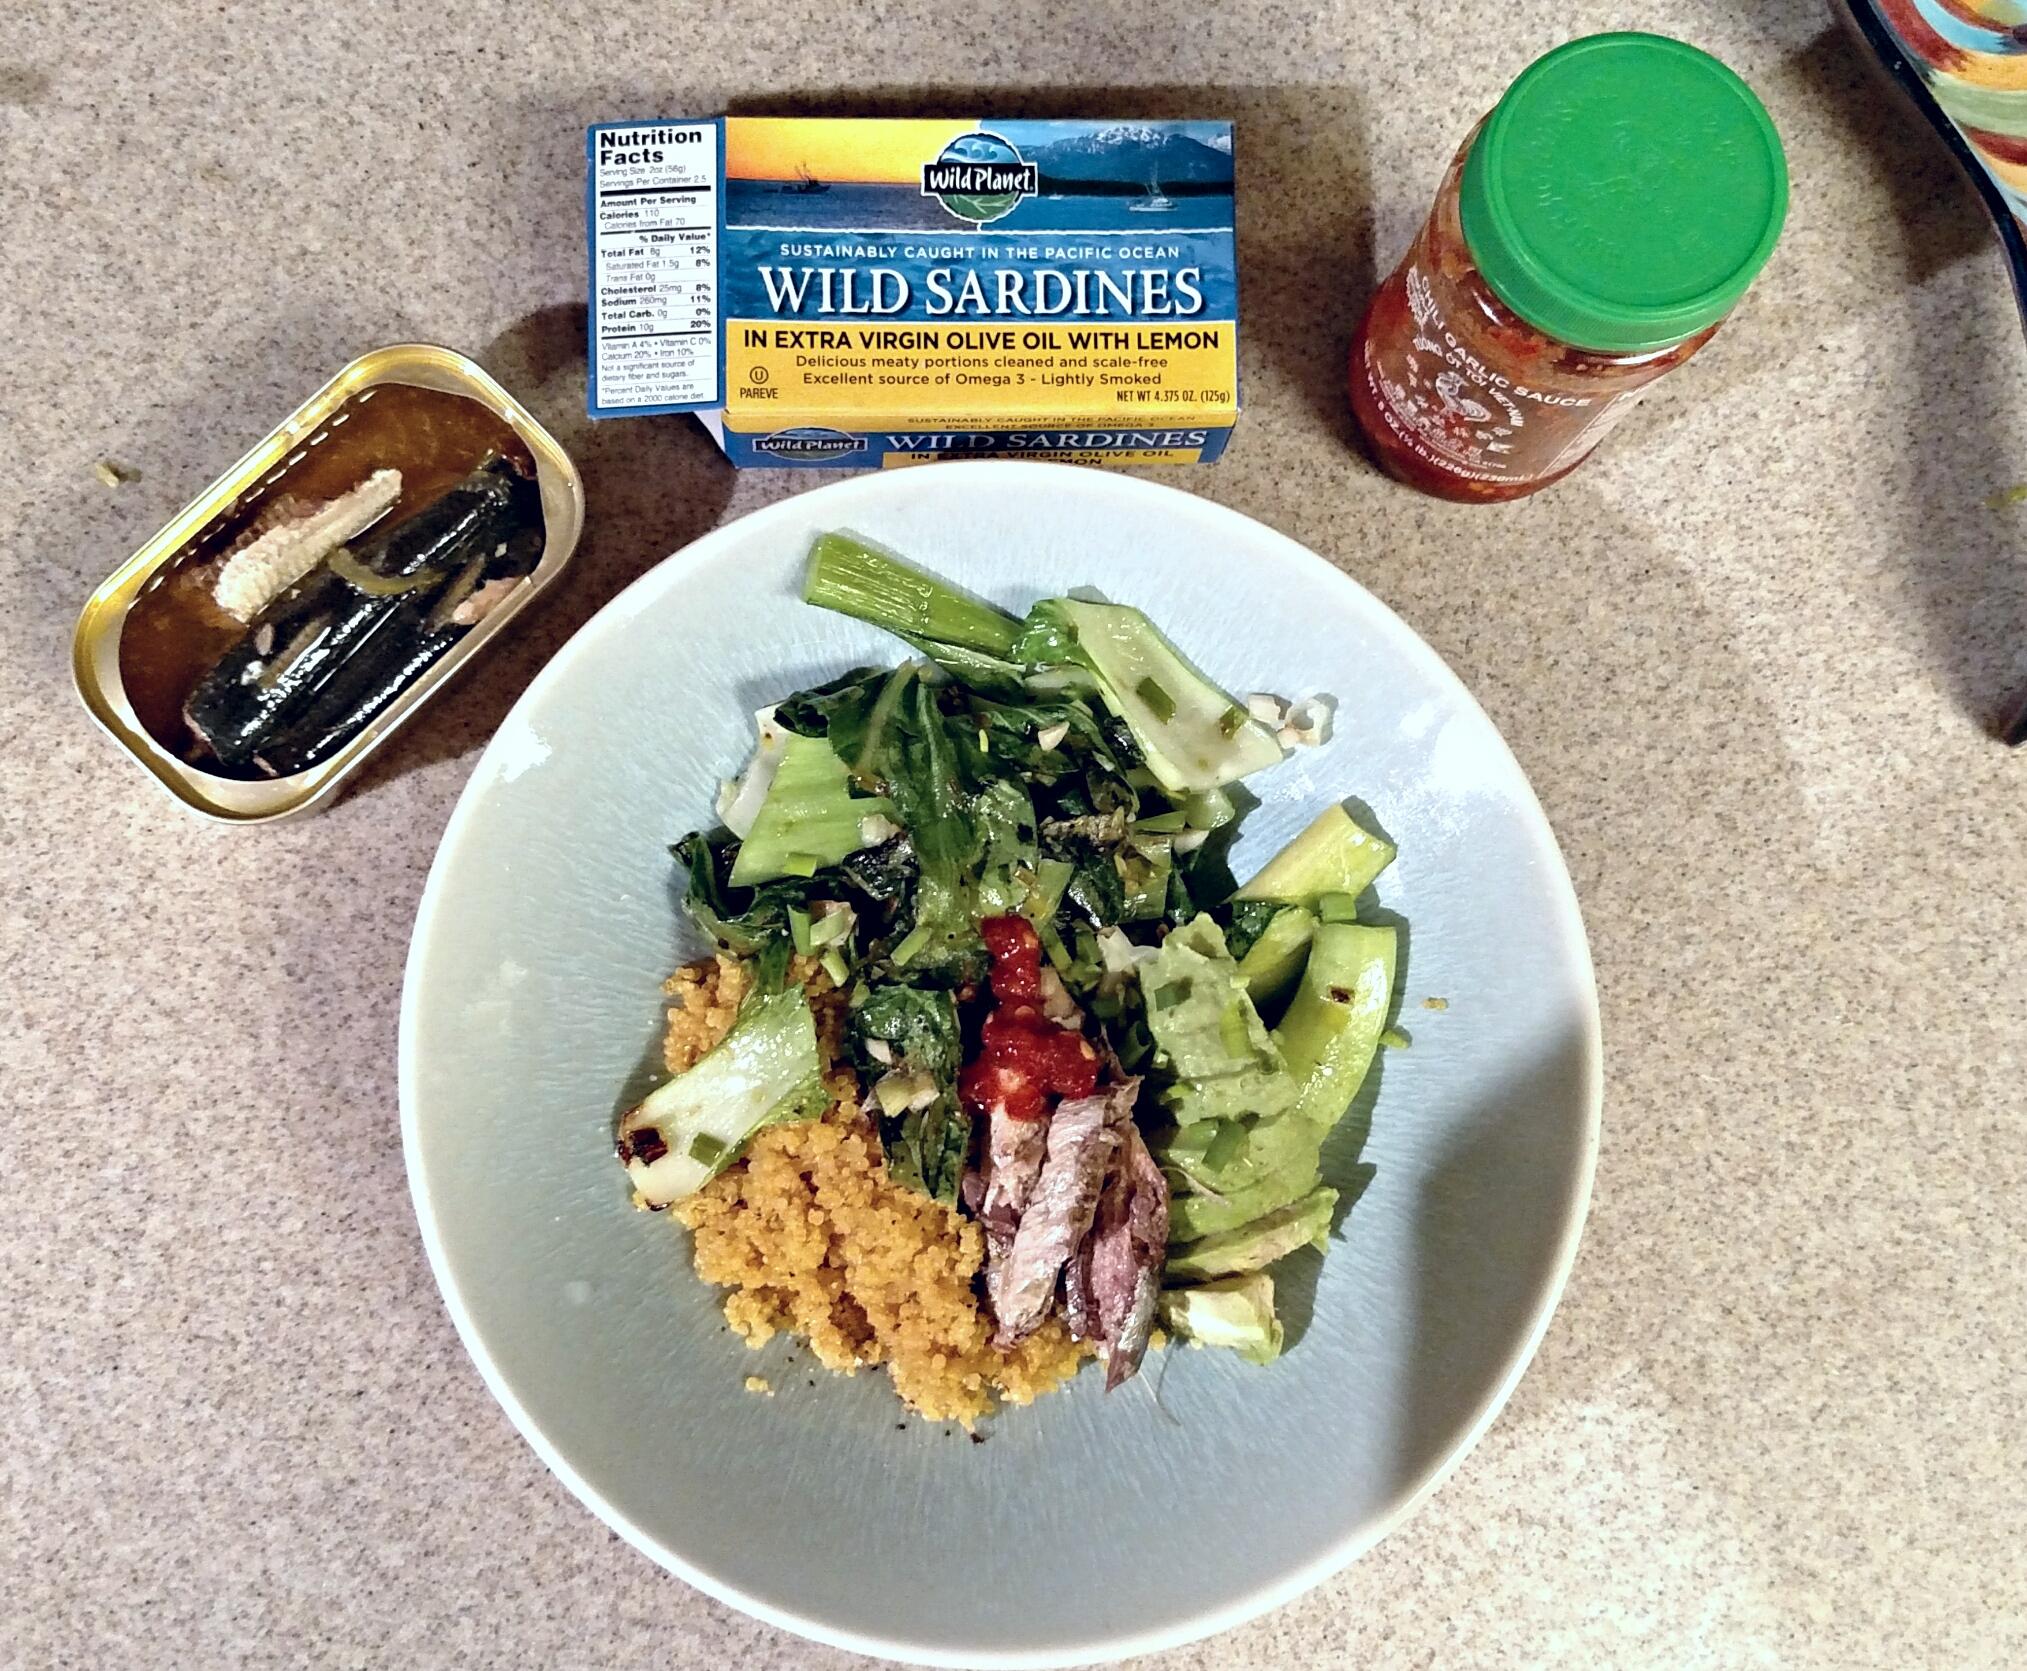 turmeric quinoa, sauteed bok choy, sardines and avocado with garlic chili paste.